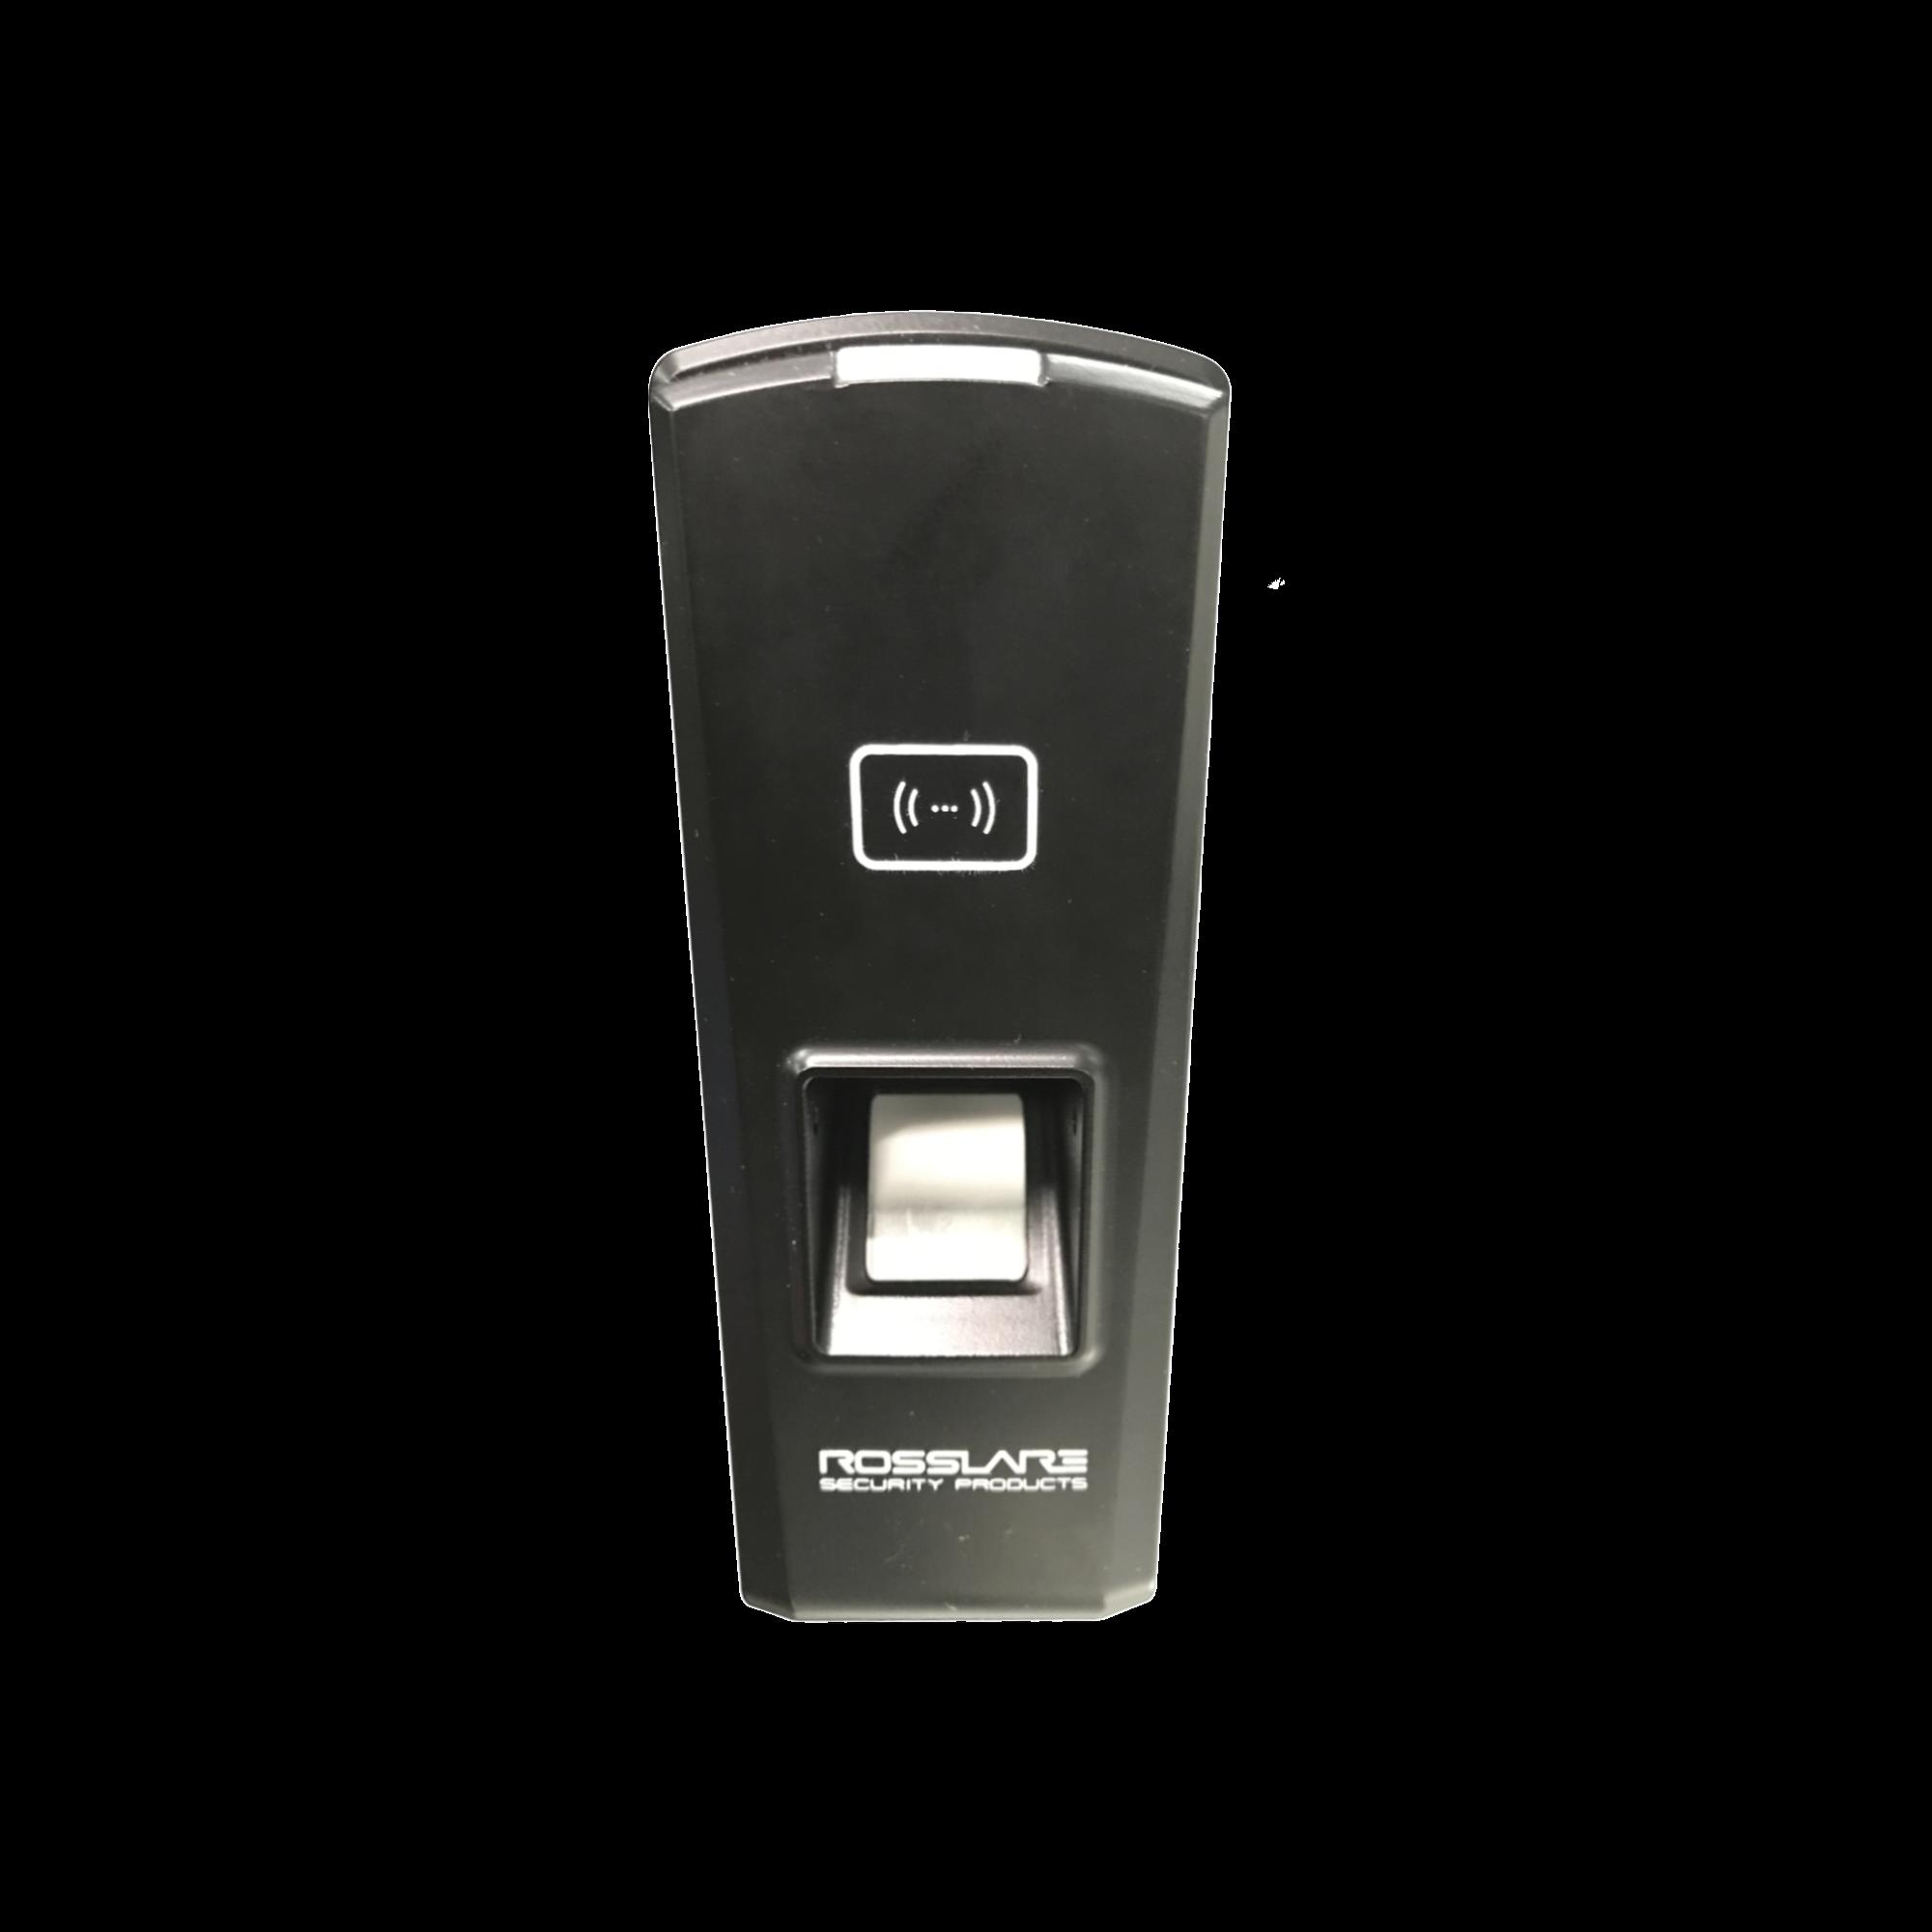 Lector Biometrico con lector  de Proximidad 125 Khz (tipo EM)